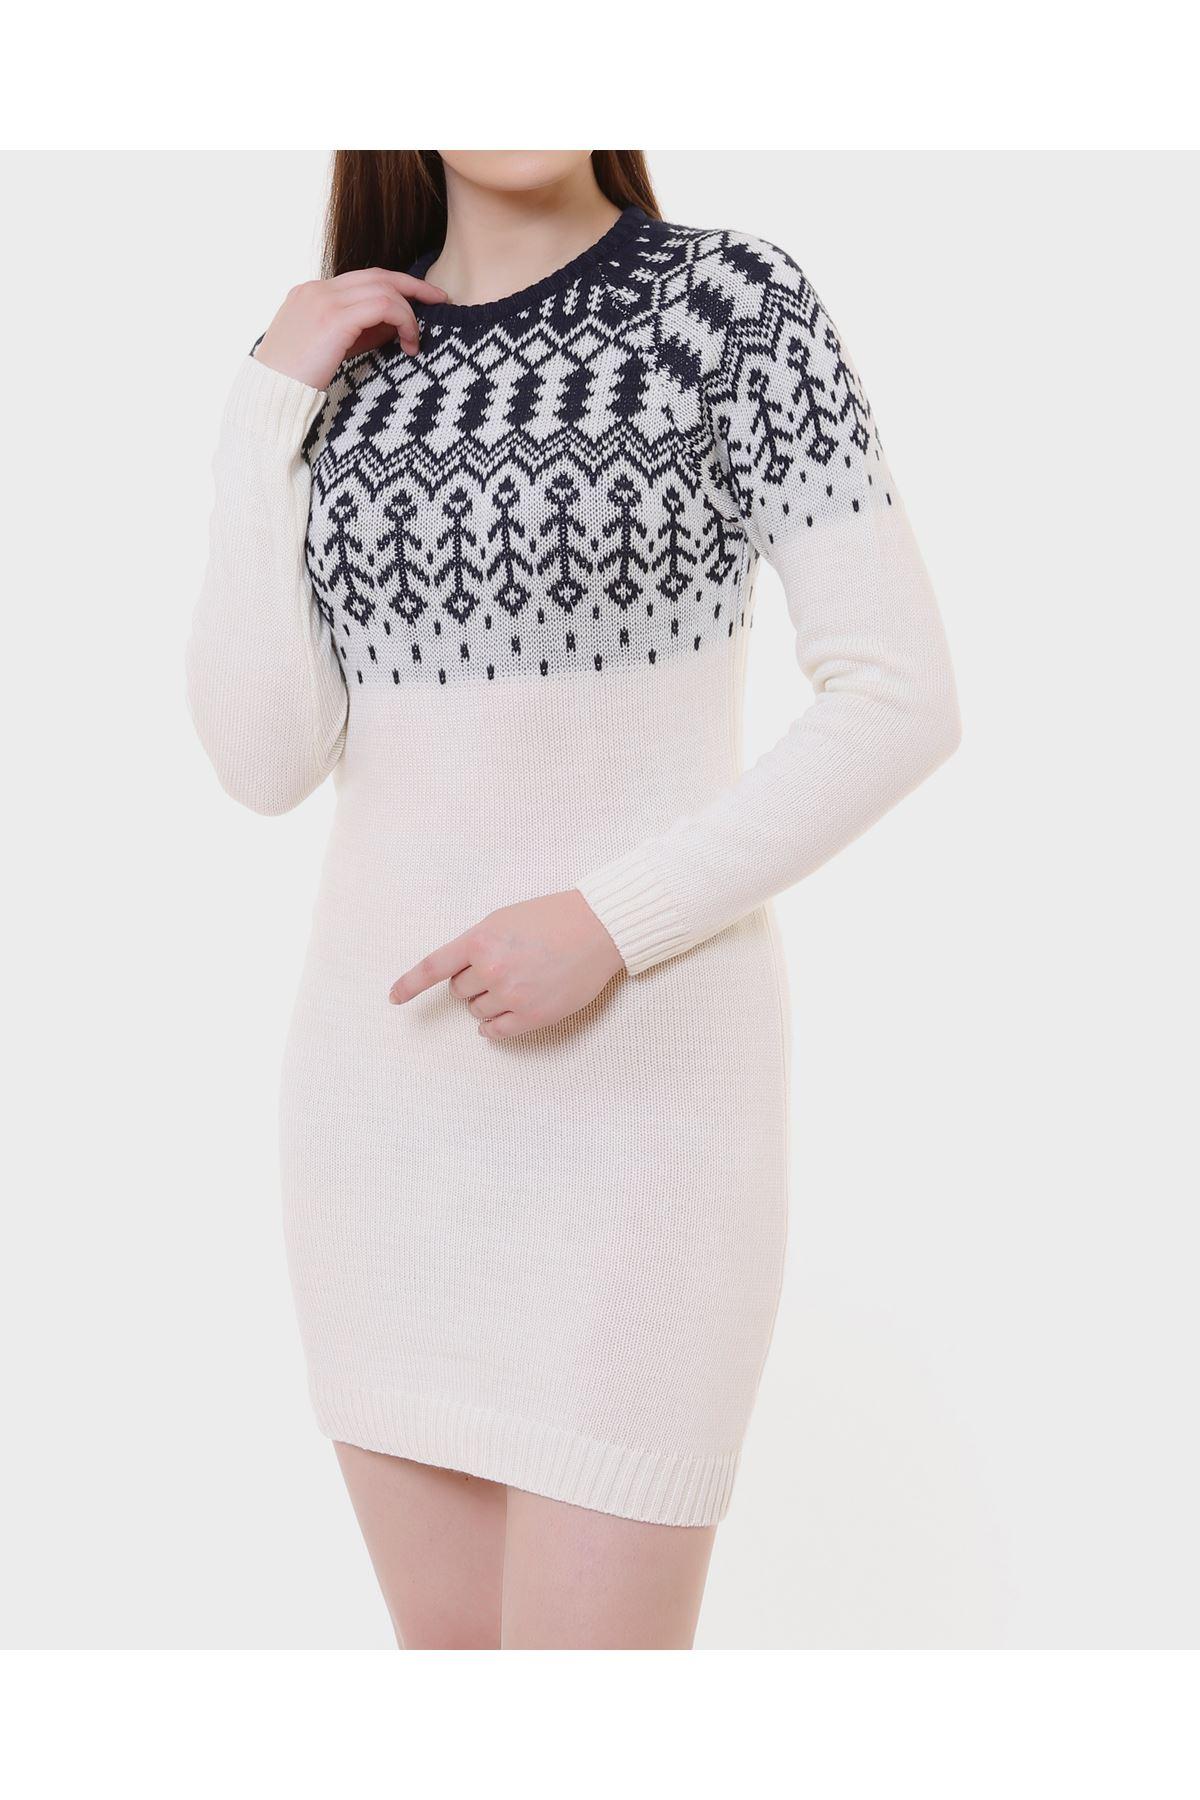 Lacivert Desenli Beyaz Bayan  Triko